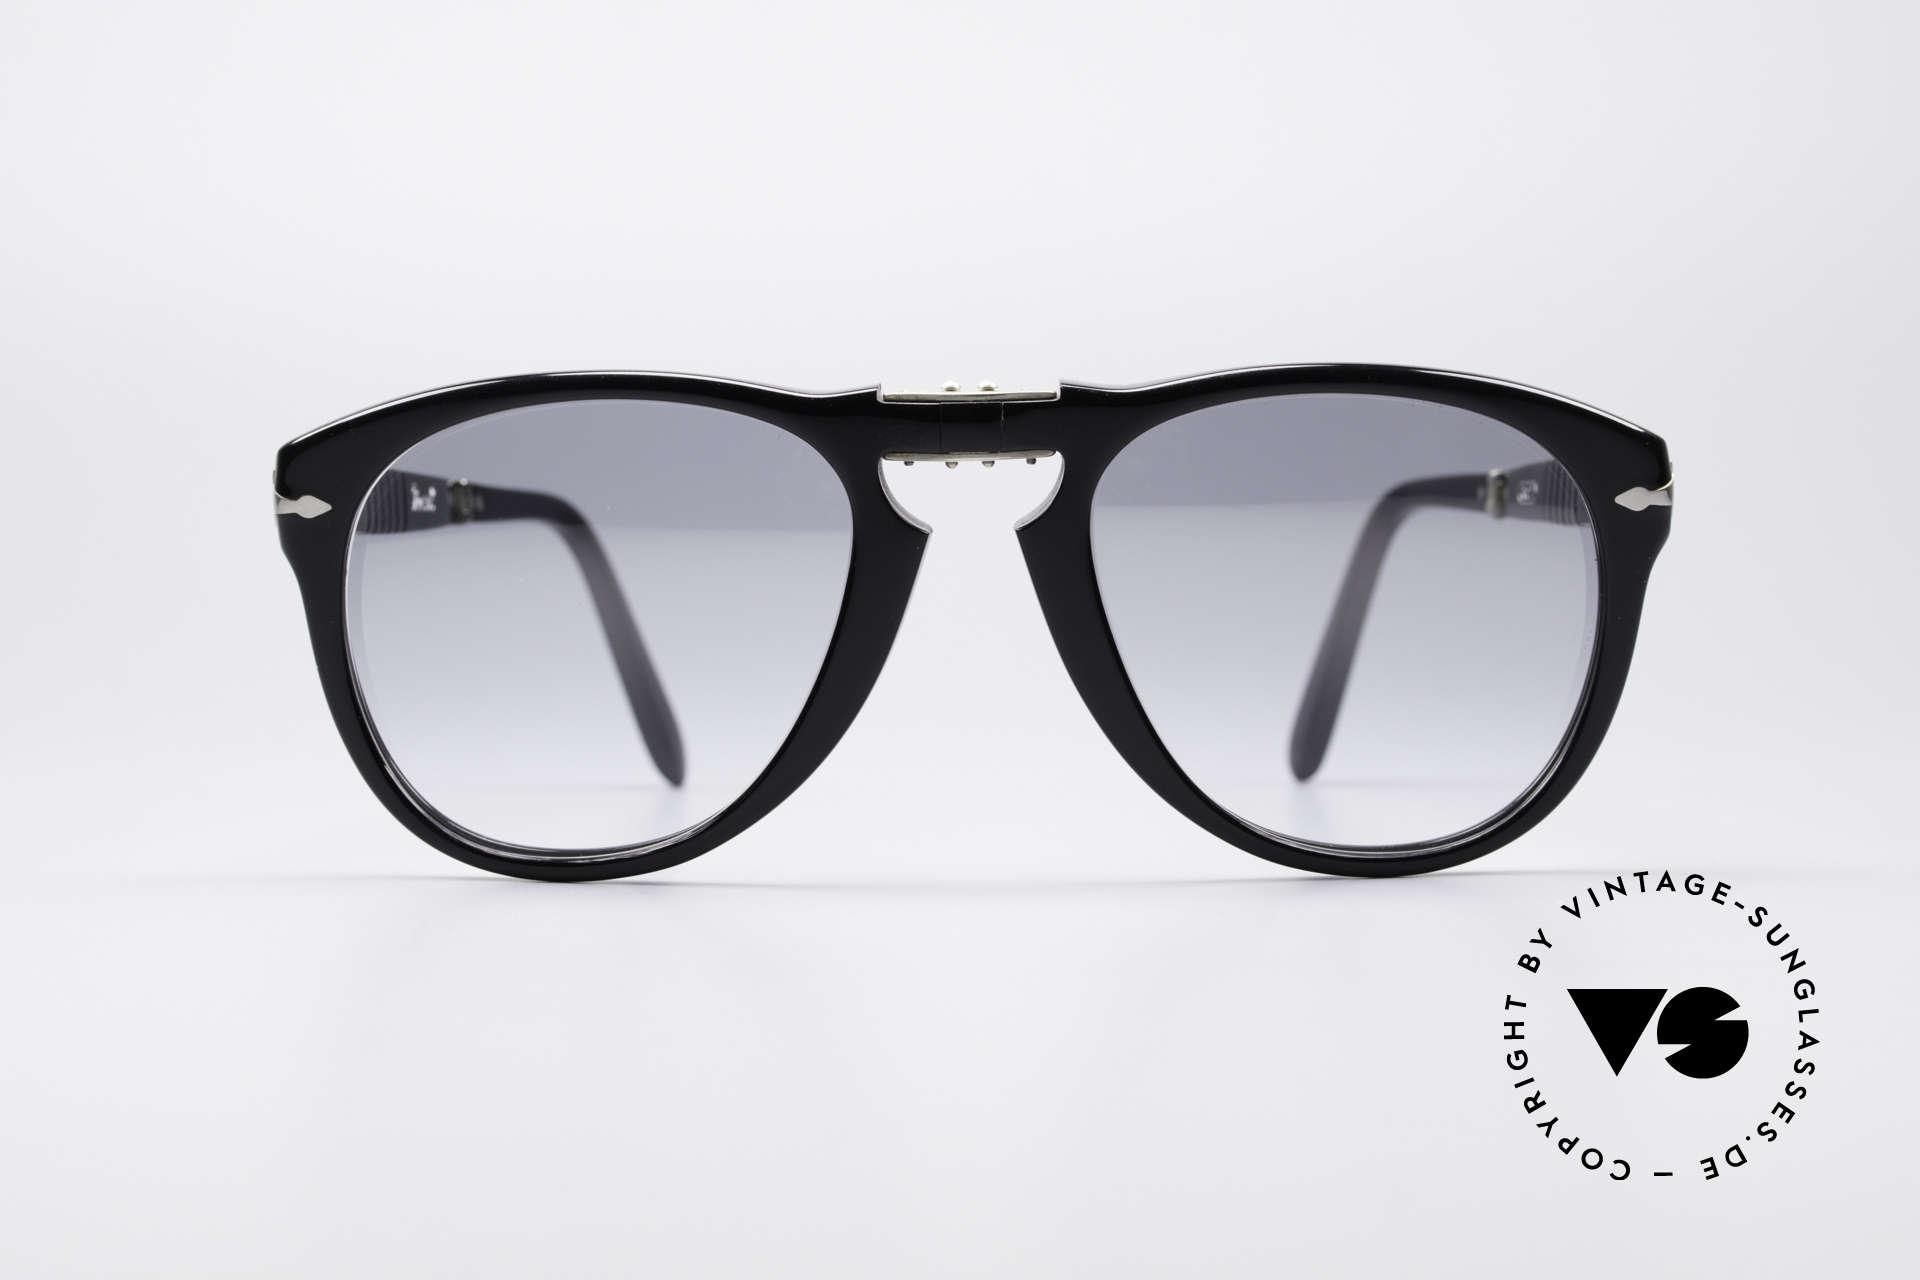 2d187dec33a44 Sunglasses Persol 714 Ratti Folding Steve McQueen Glasses